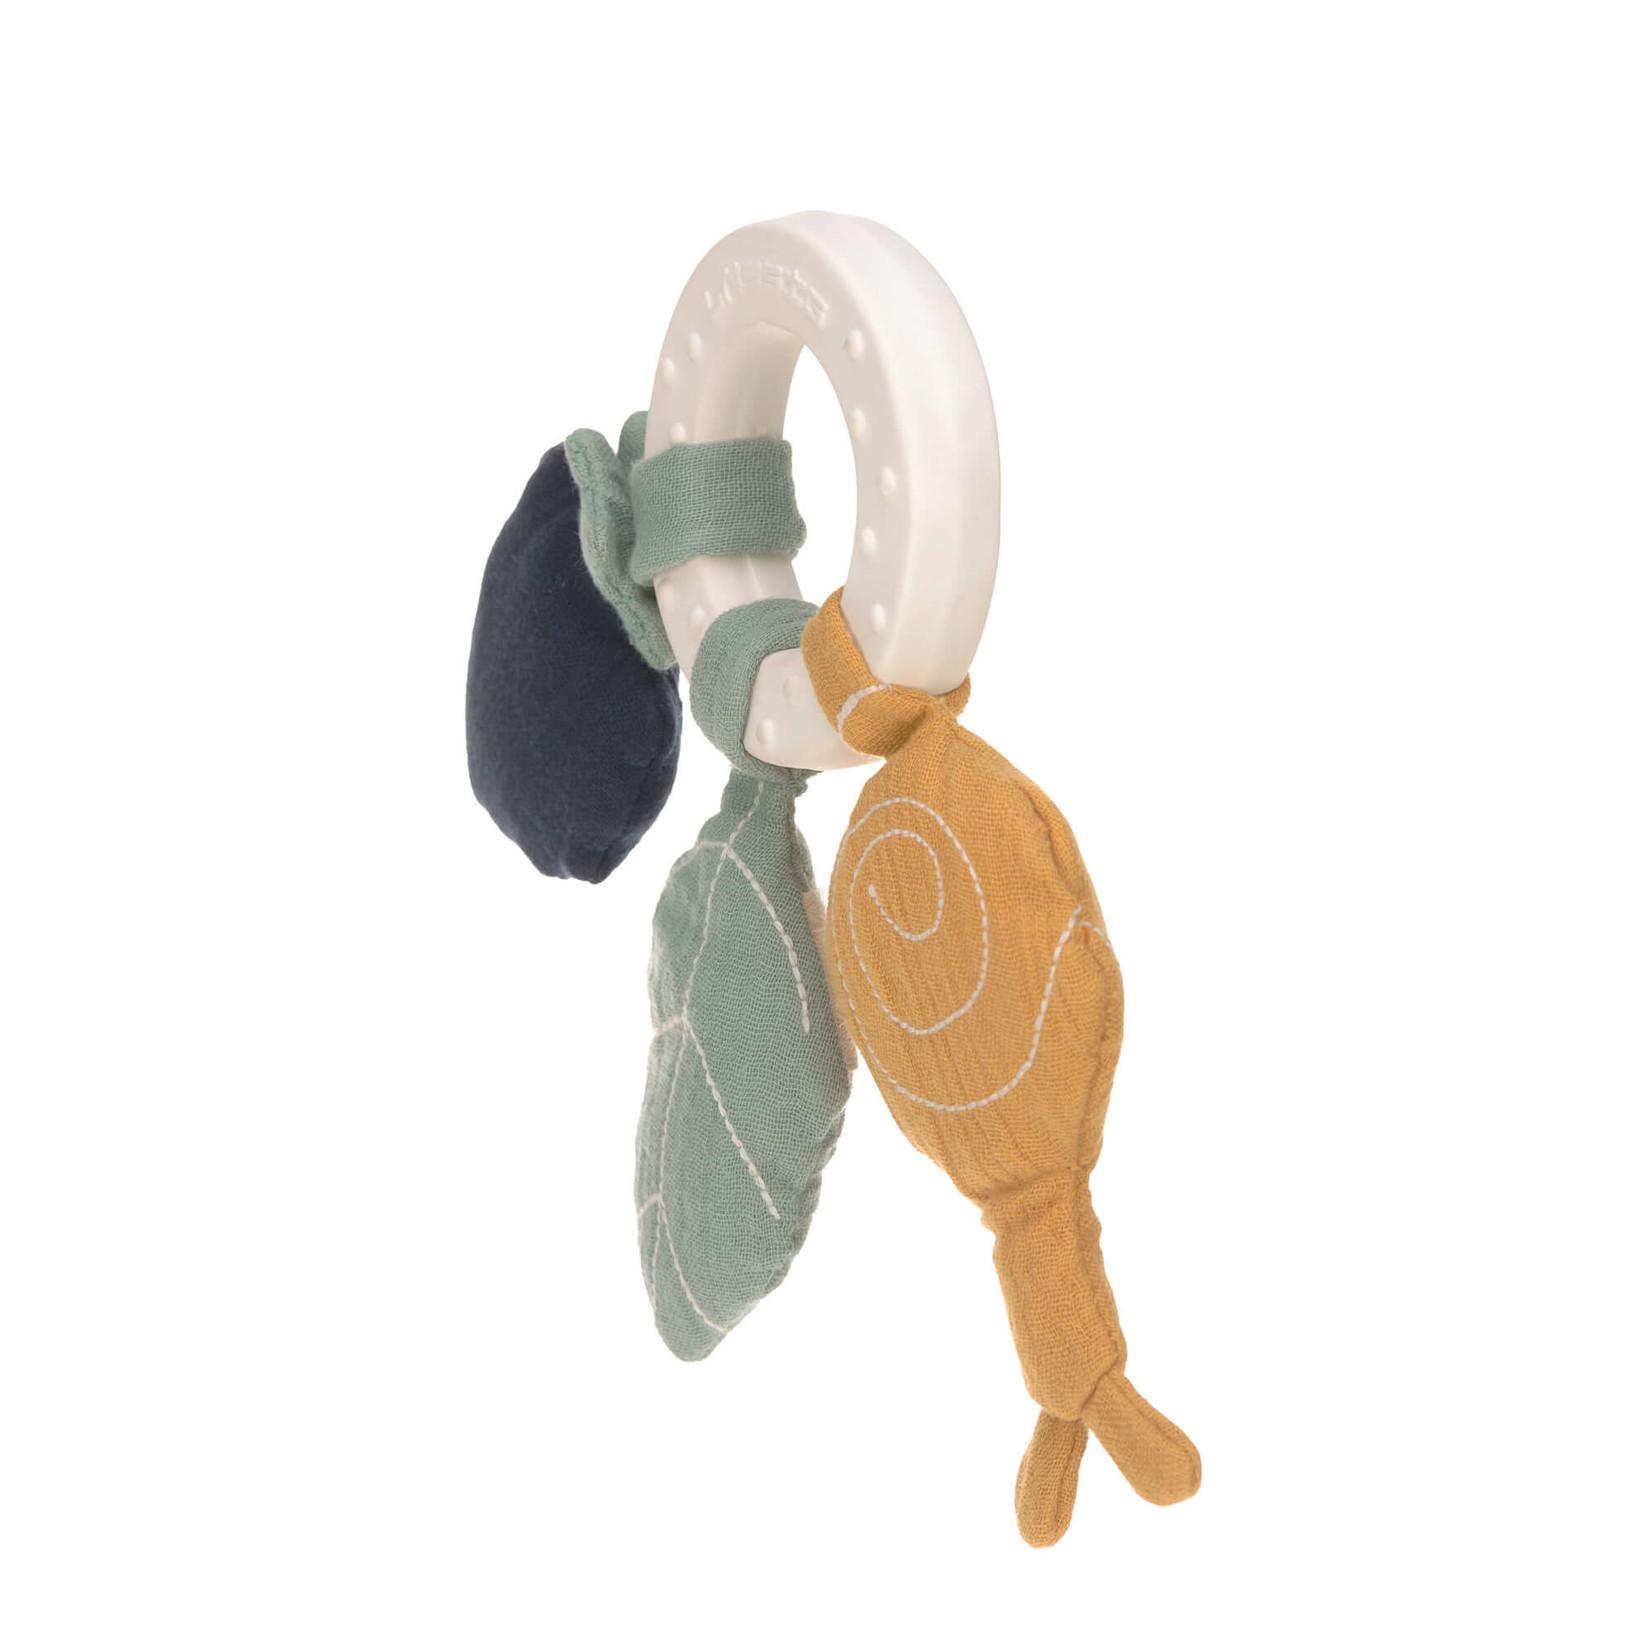 Lässig Teether Ring Natural Rubber Snail